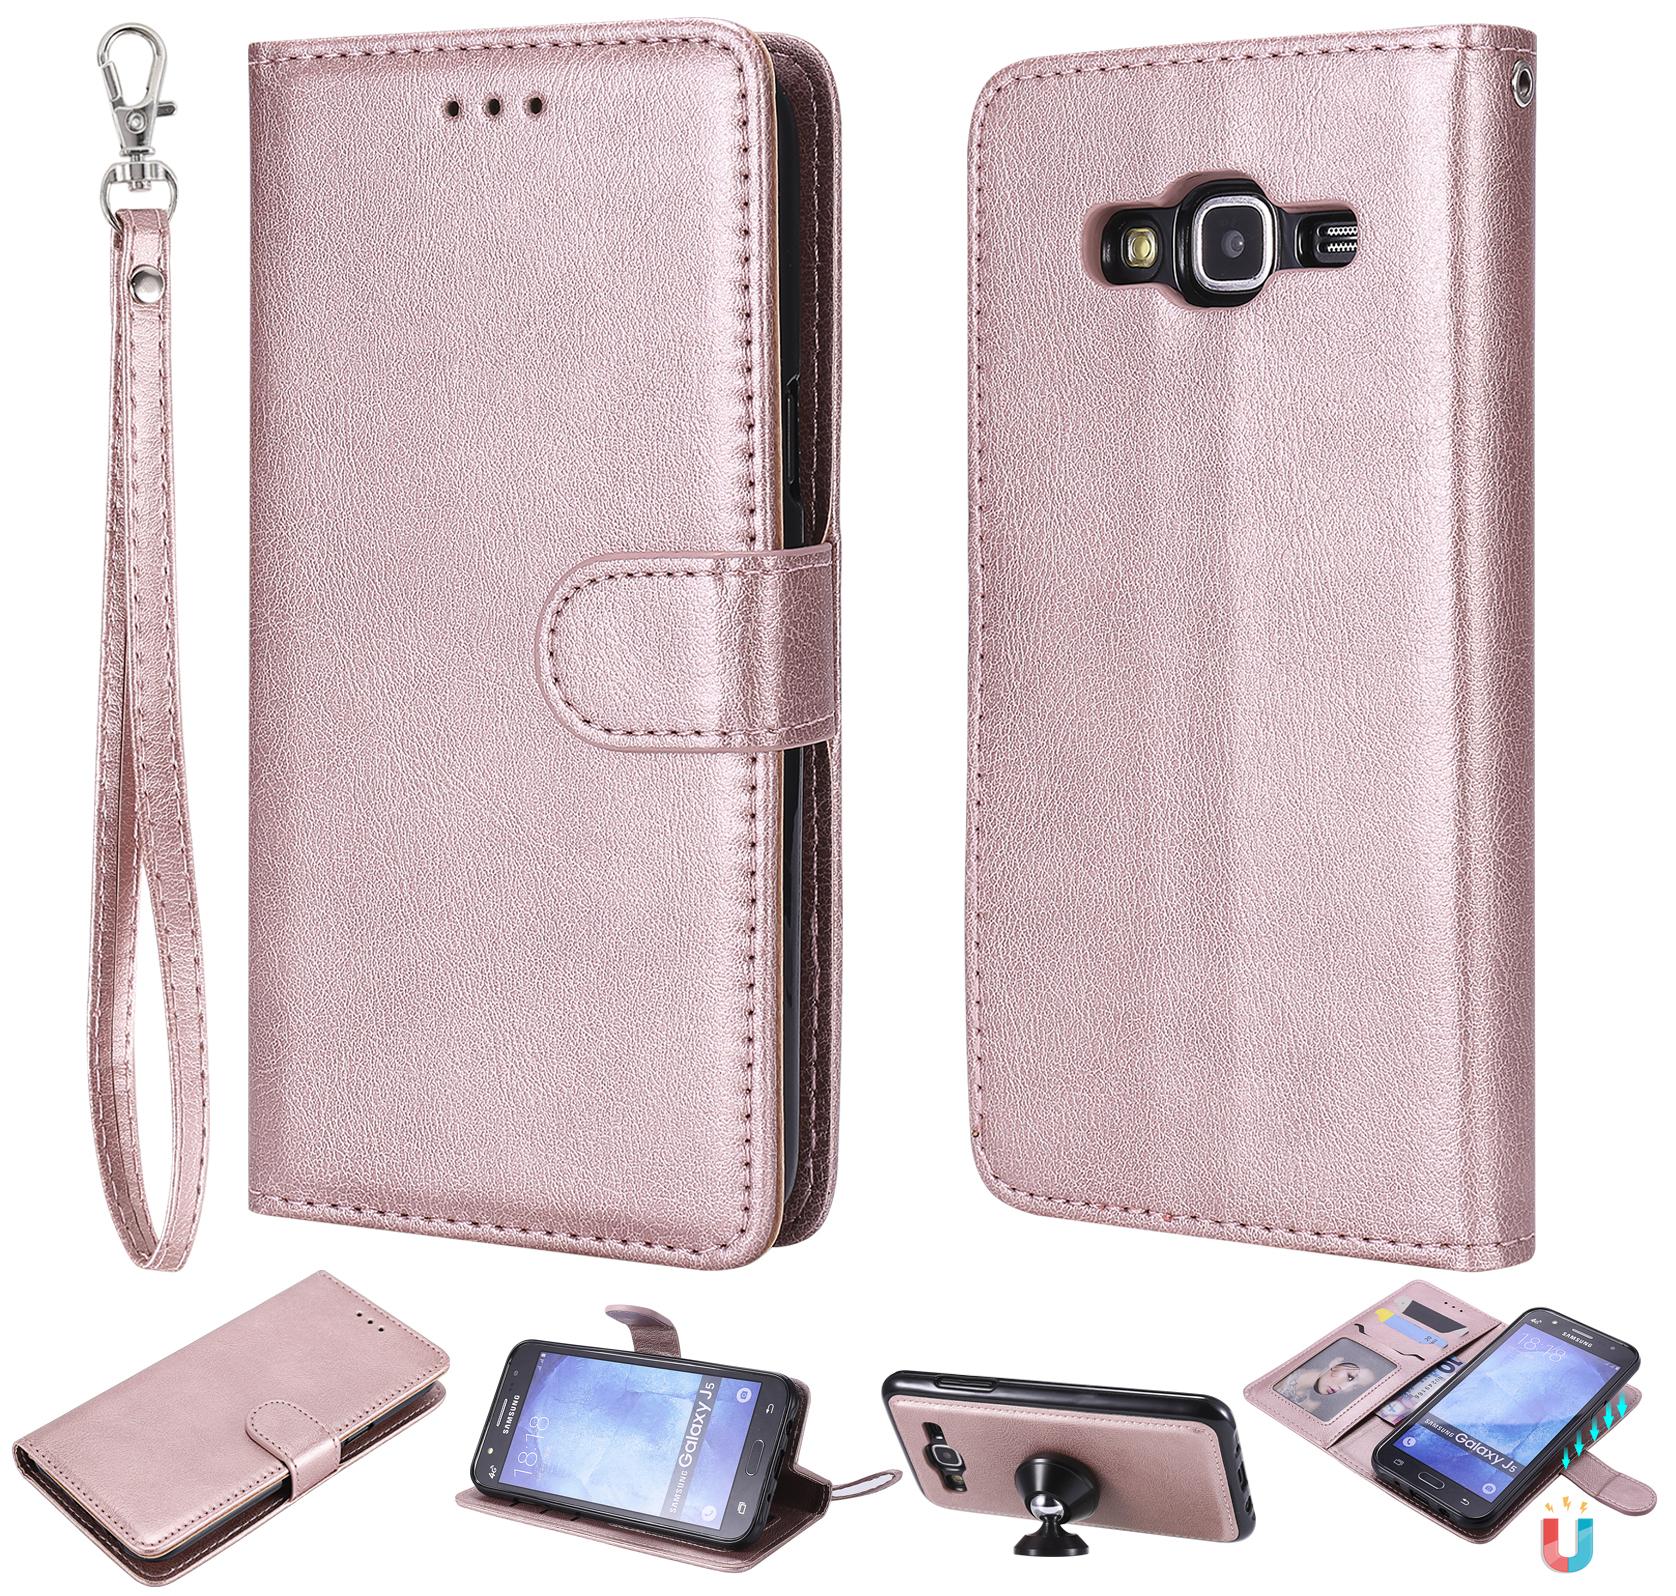 griffin survivor galaxy s5 casesgalaxy s5 case wallet, s5 case, allytech premium leather flip case cover \u0026 card